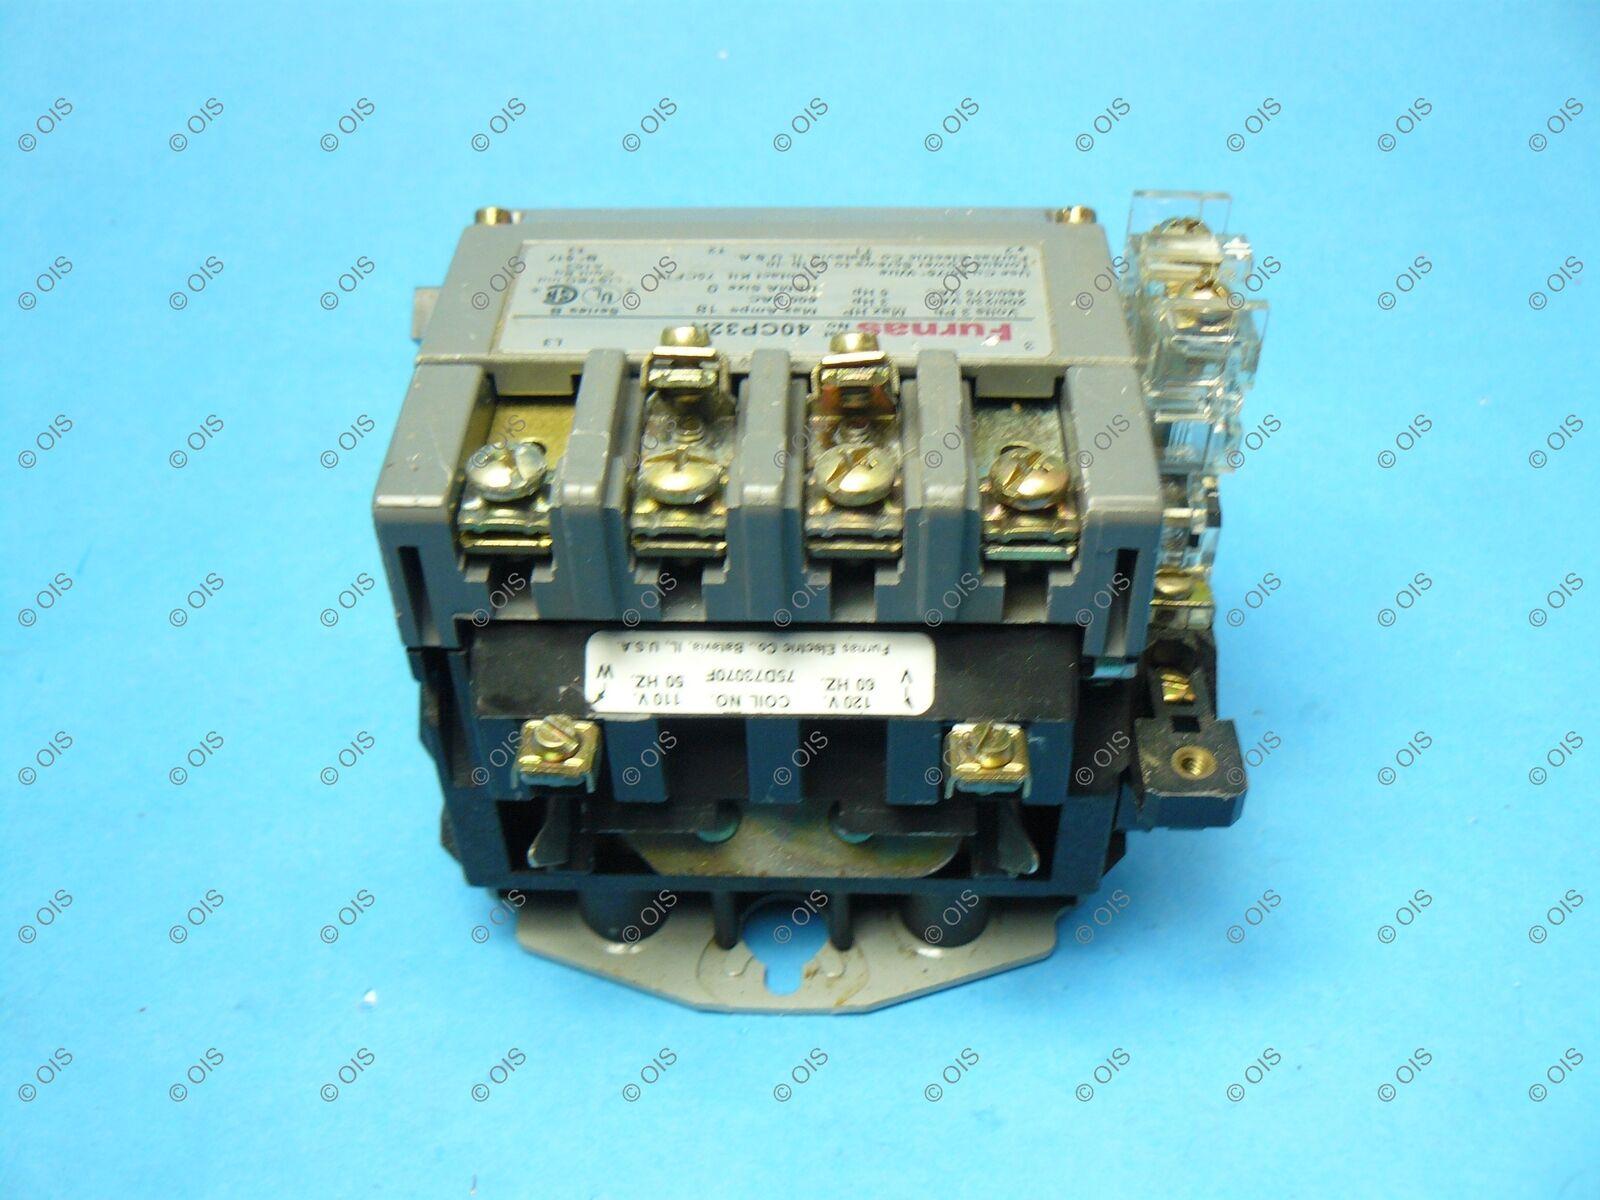 Furnas 40CP32AF NEMA Size 0 Contactor 3 Pole 120VAC Coil 18 Amp